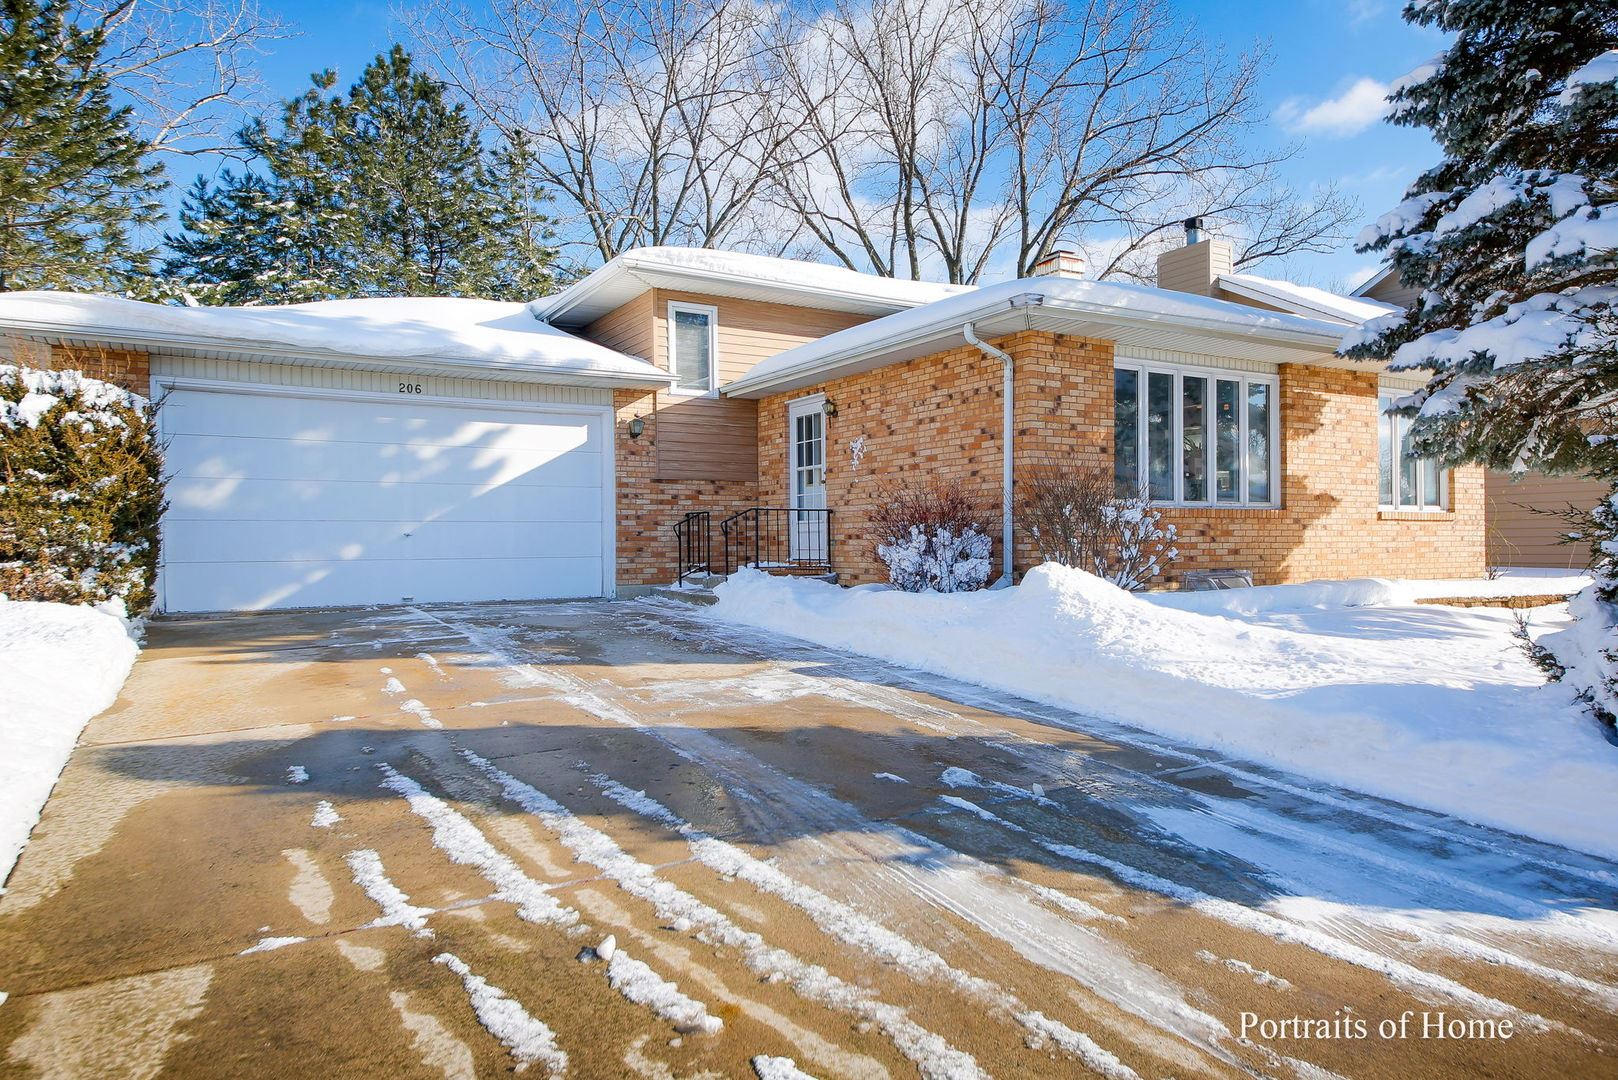 Photo of 206 Roman Circle, Bolingbrook, IL 60440 (MLS # 10984987)